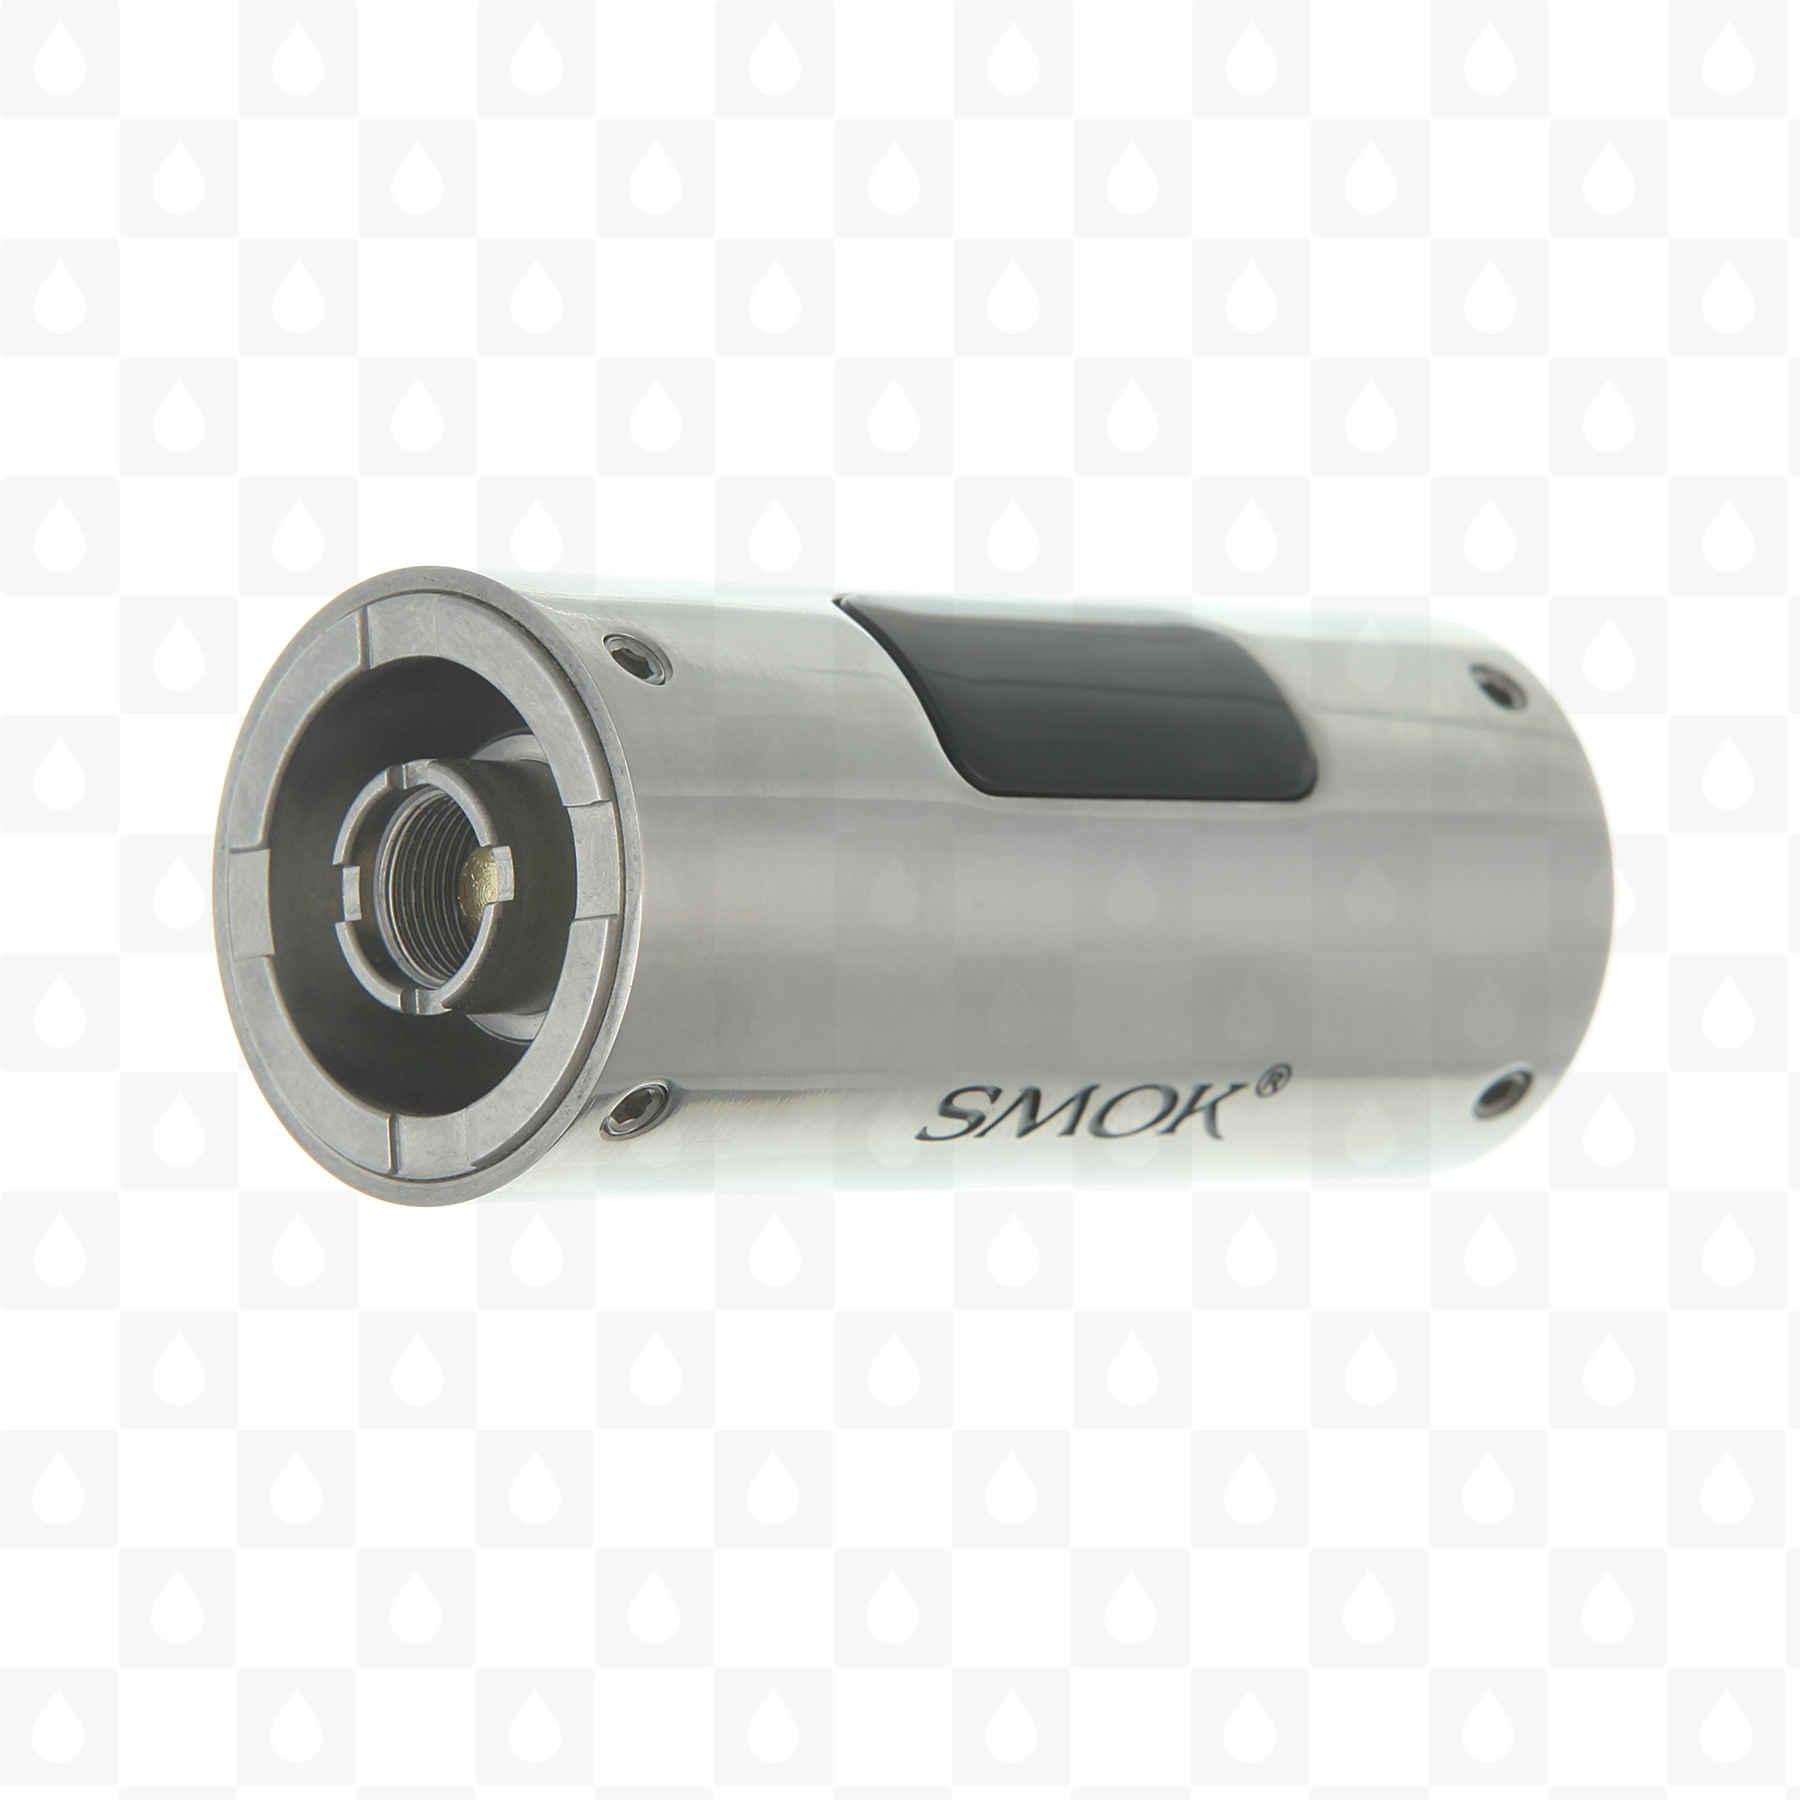 Inline Volt Meter : Smok omnitester ii inline resistance ohms voltage